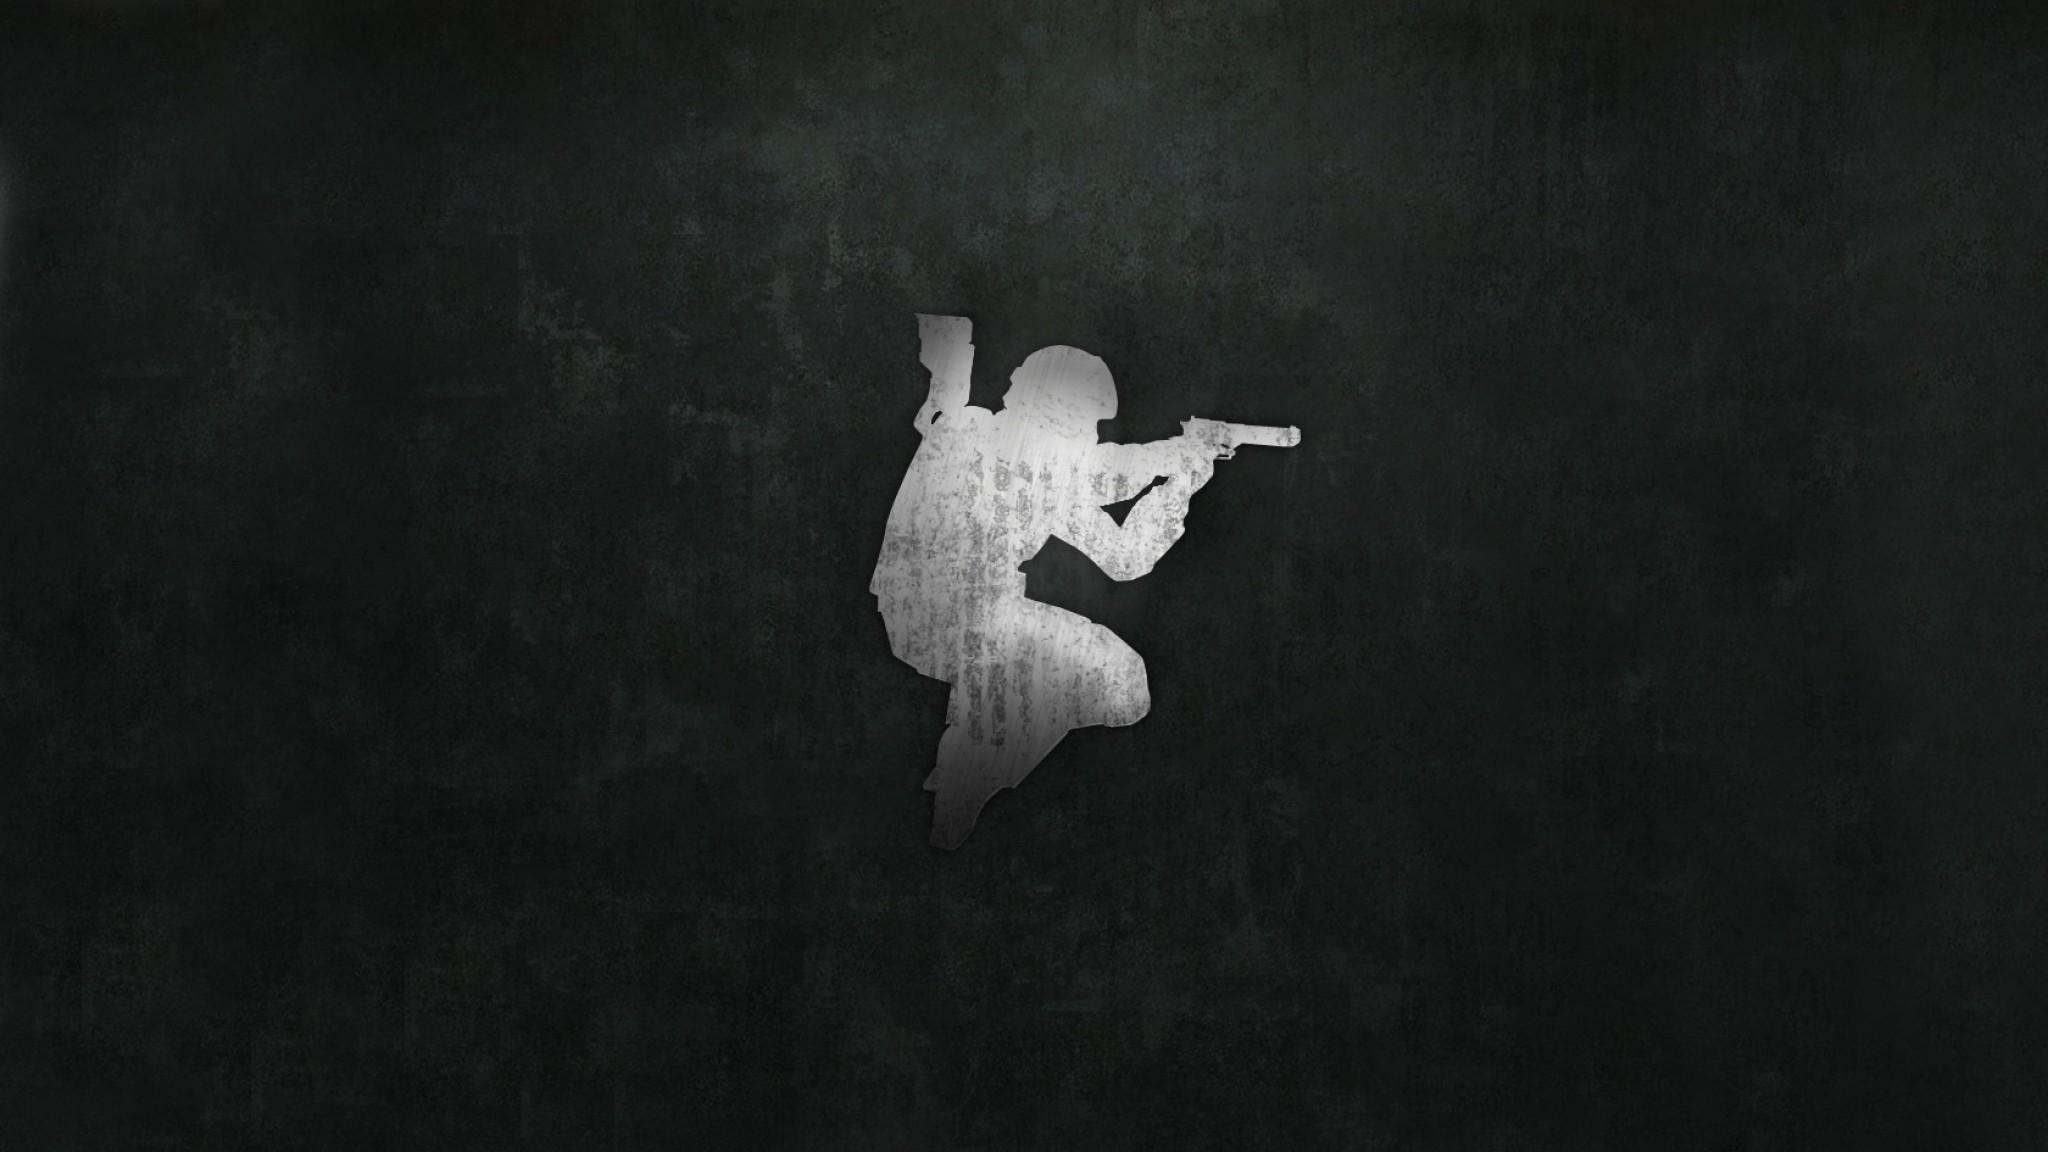 Wallpaper counter-strike, picture, background, pistol, soldier